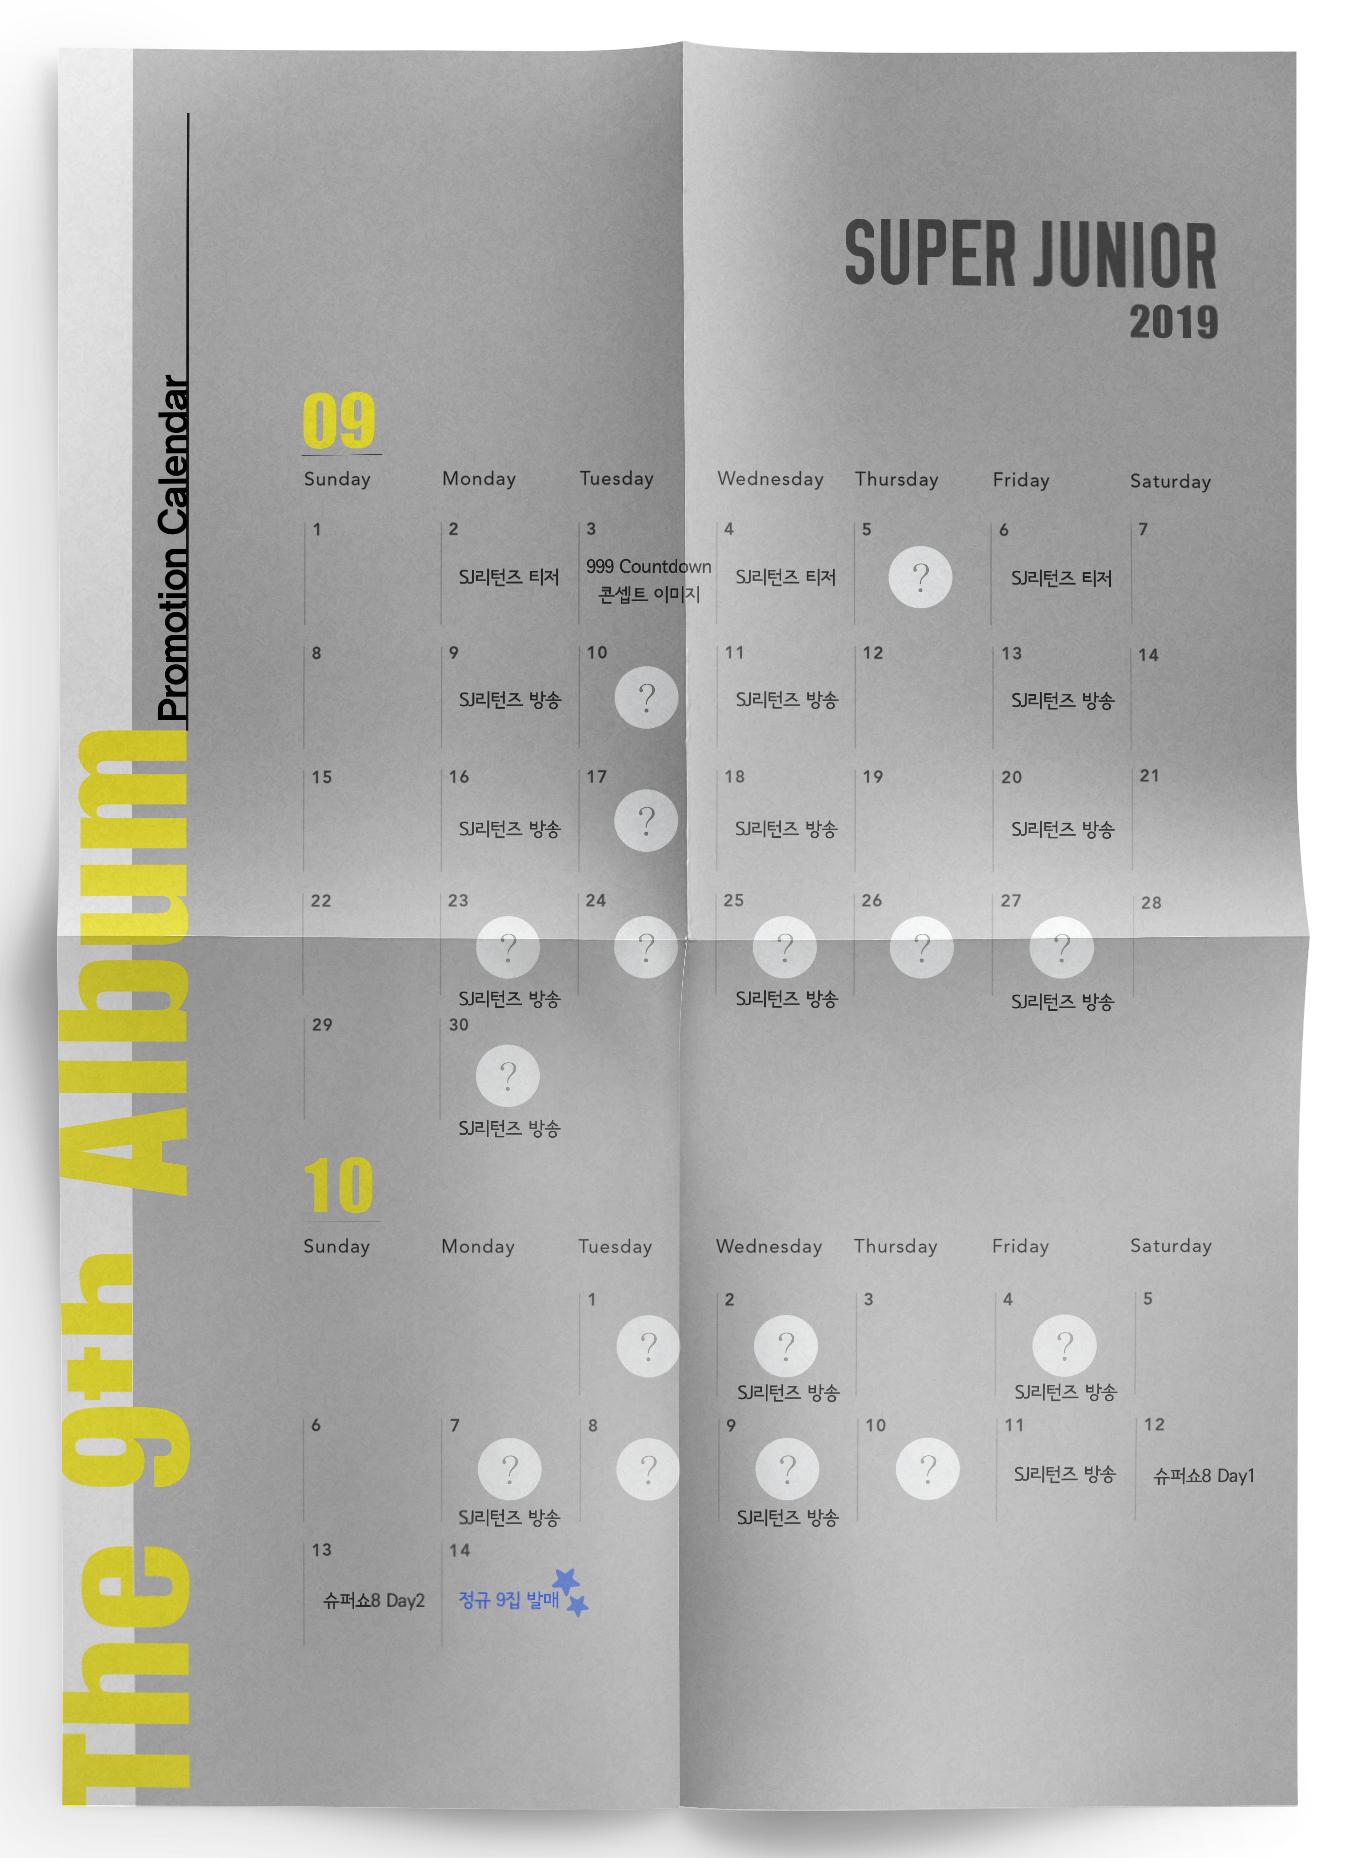 SUPER JUNIOR正规9辑宣传月历公开 满满的问号提升期待感!